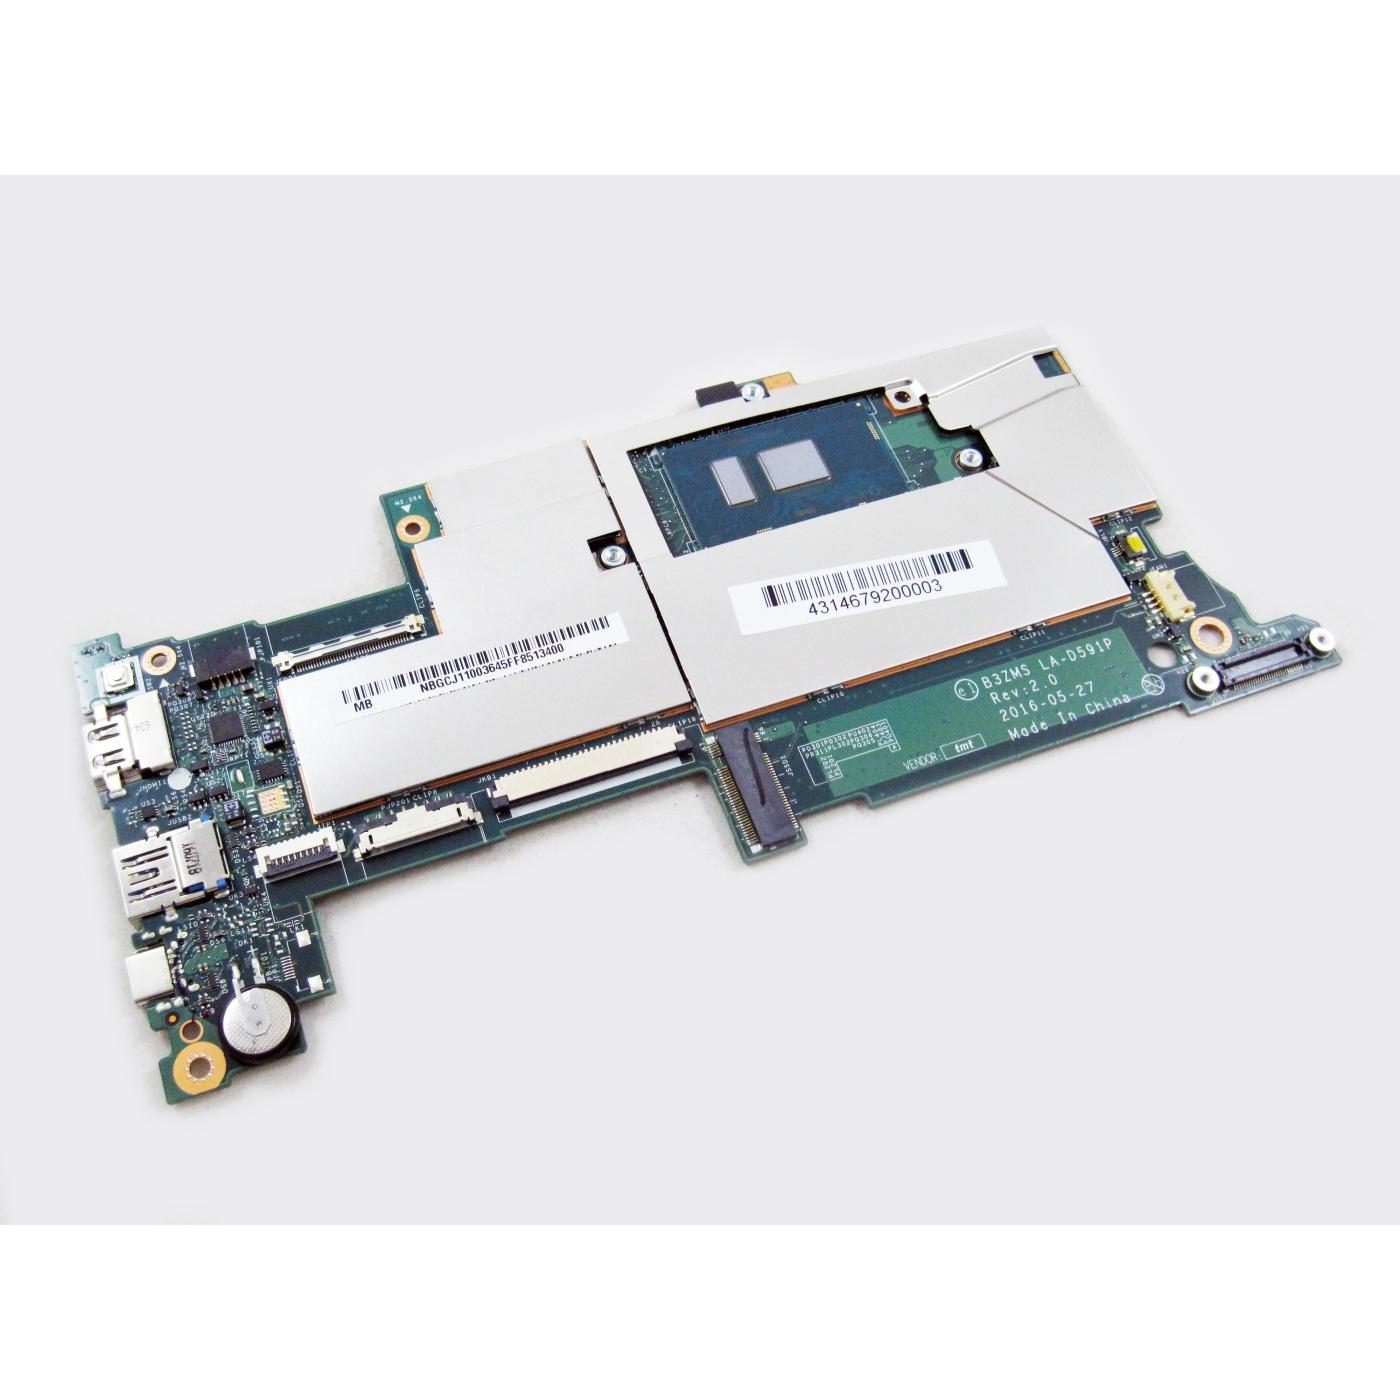 Acer NB.GCJ11.003 Aspire Swift I5-7200U 4GB Uma Notebook Motherboard